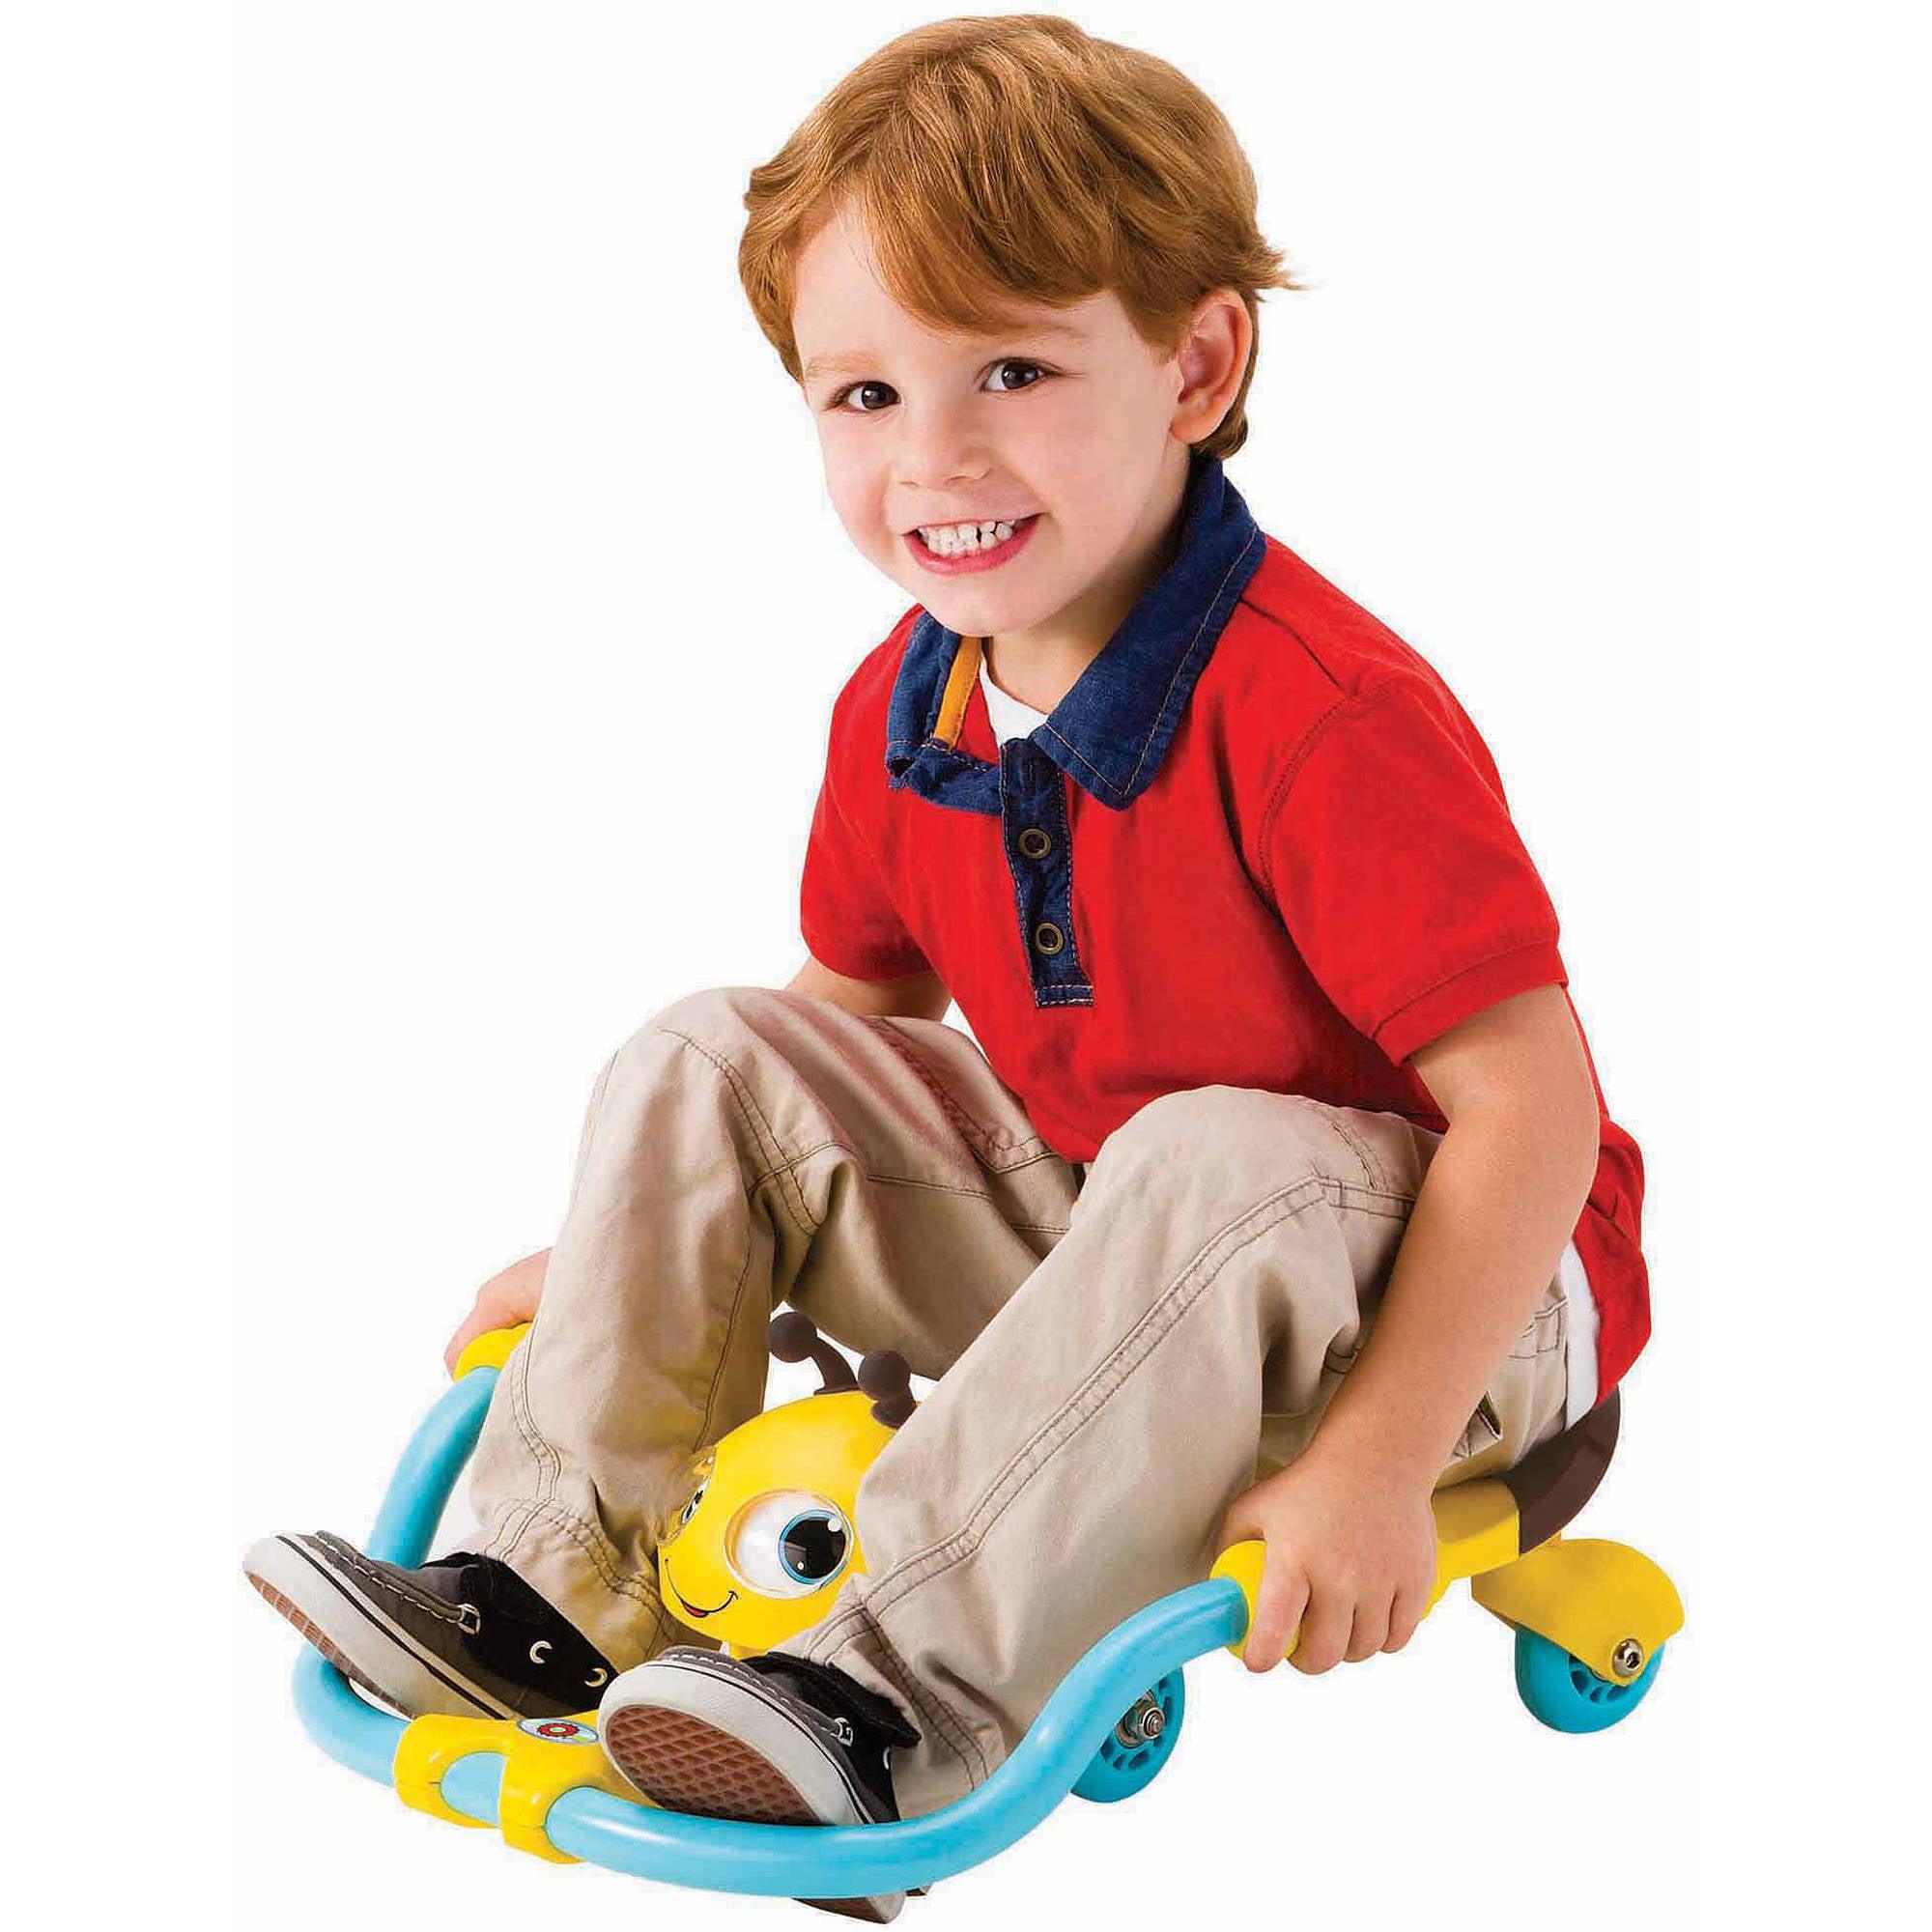 Razor Spark 2.0 Scooter - Walmart.com Kids Sitting Scooter